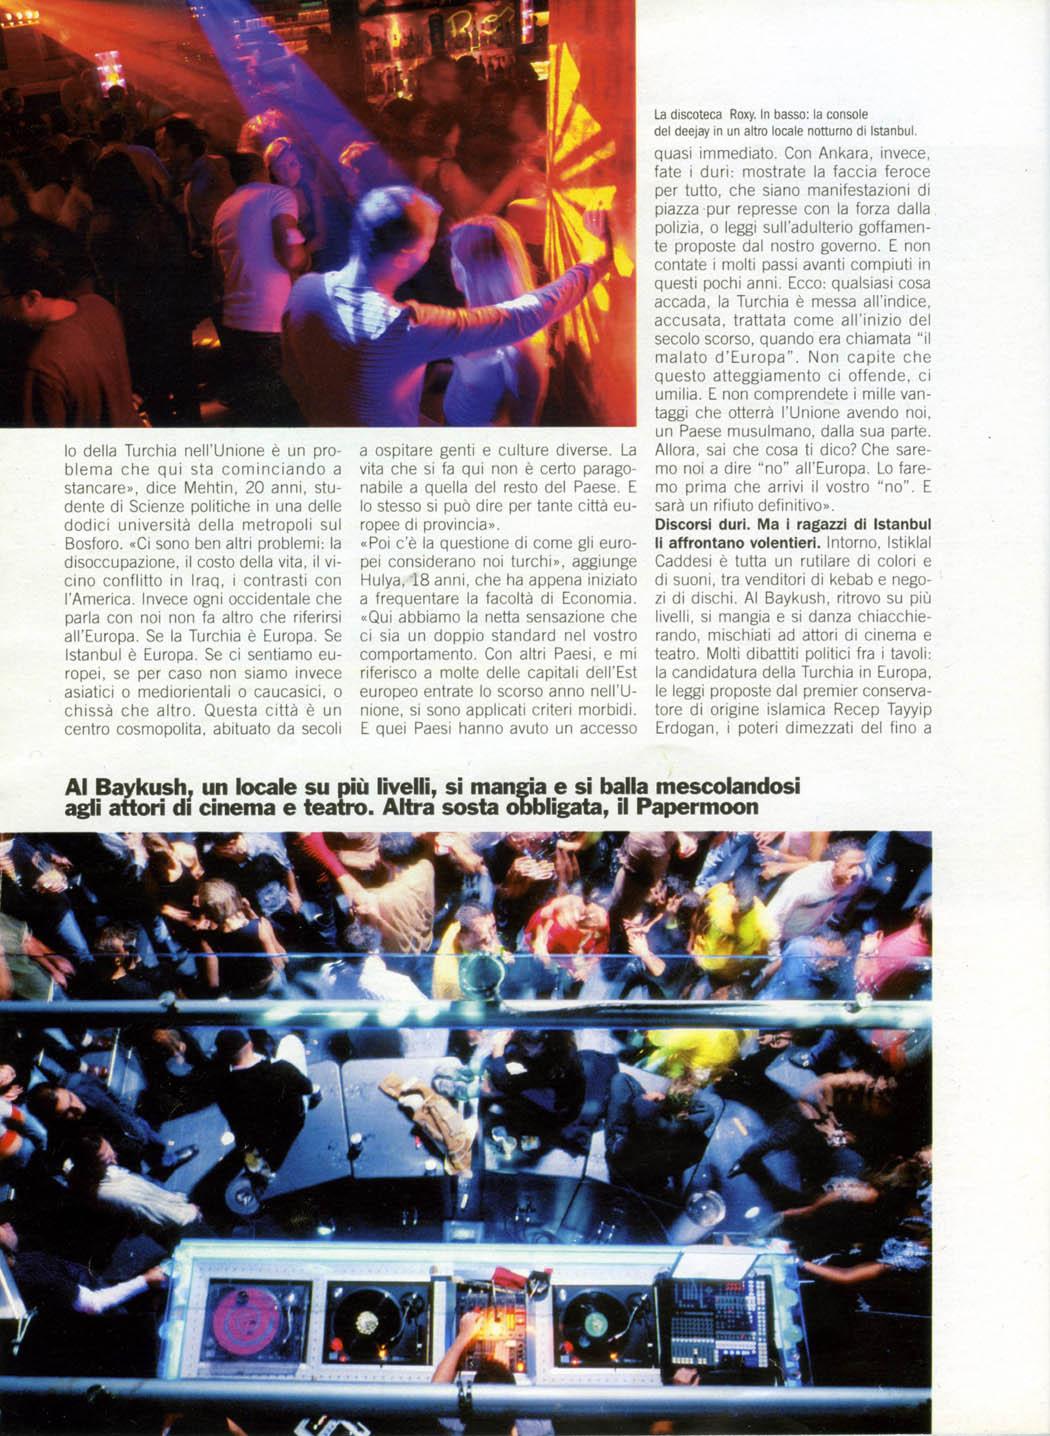 La Republica/ Italy